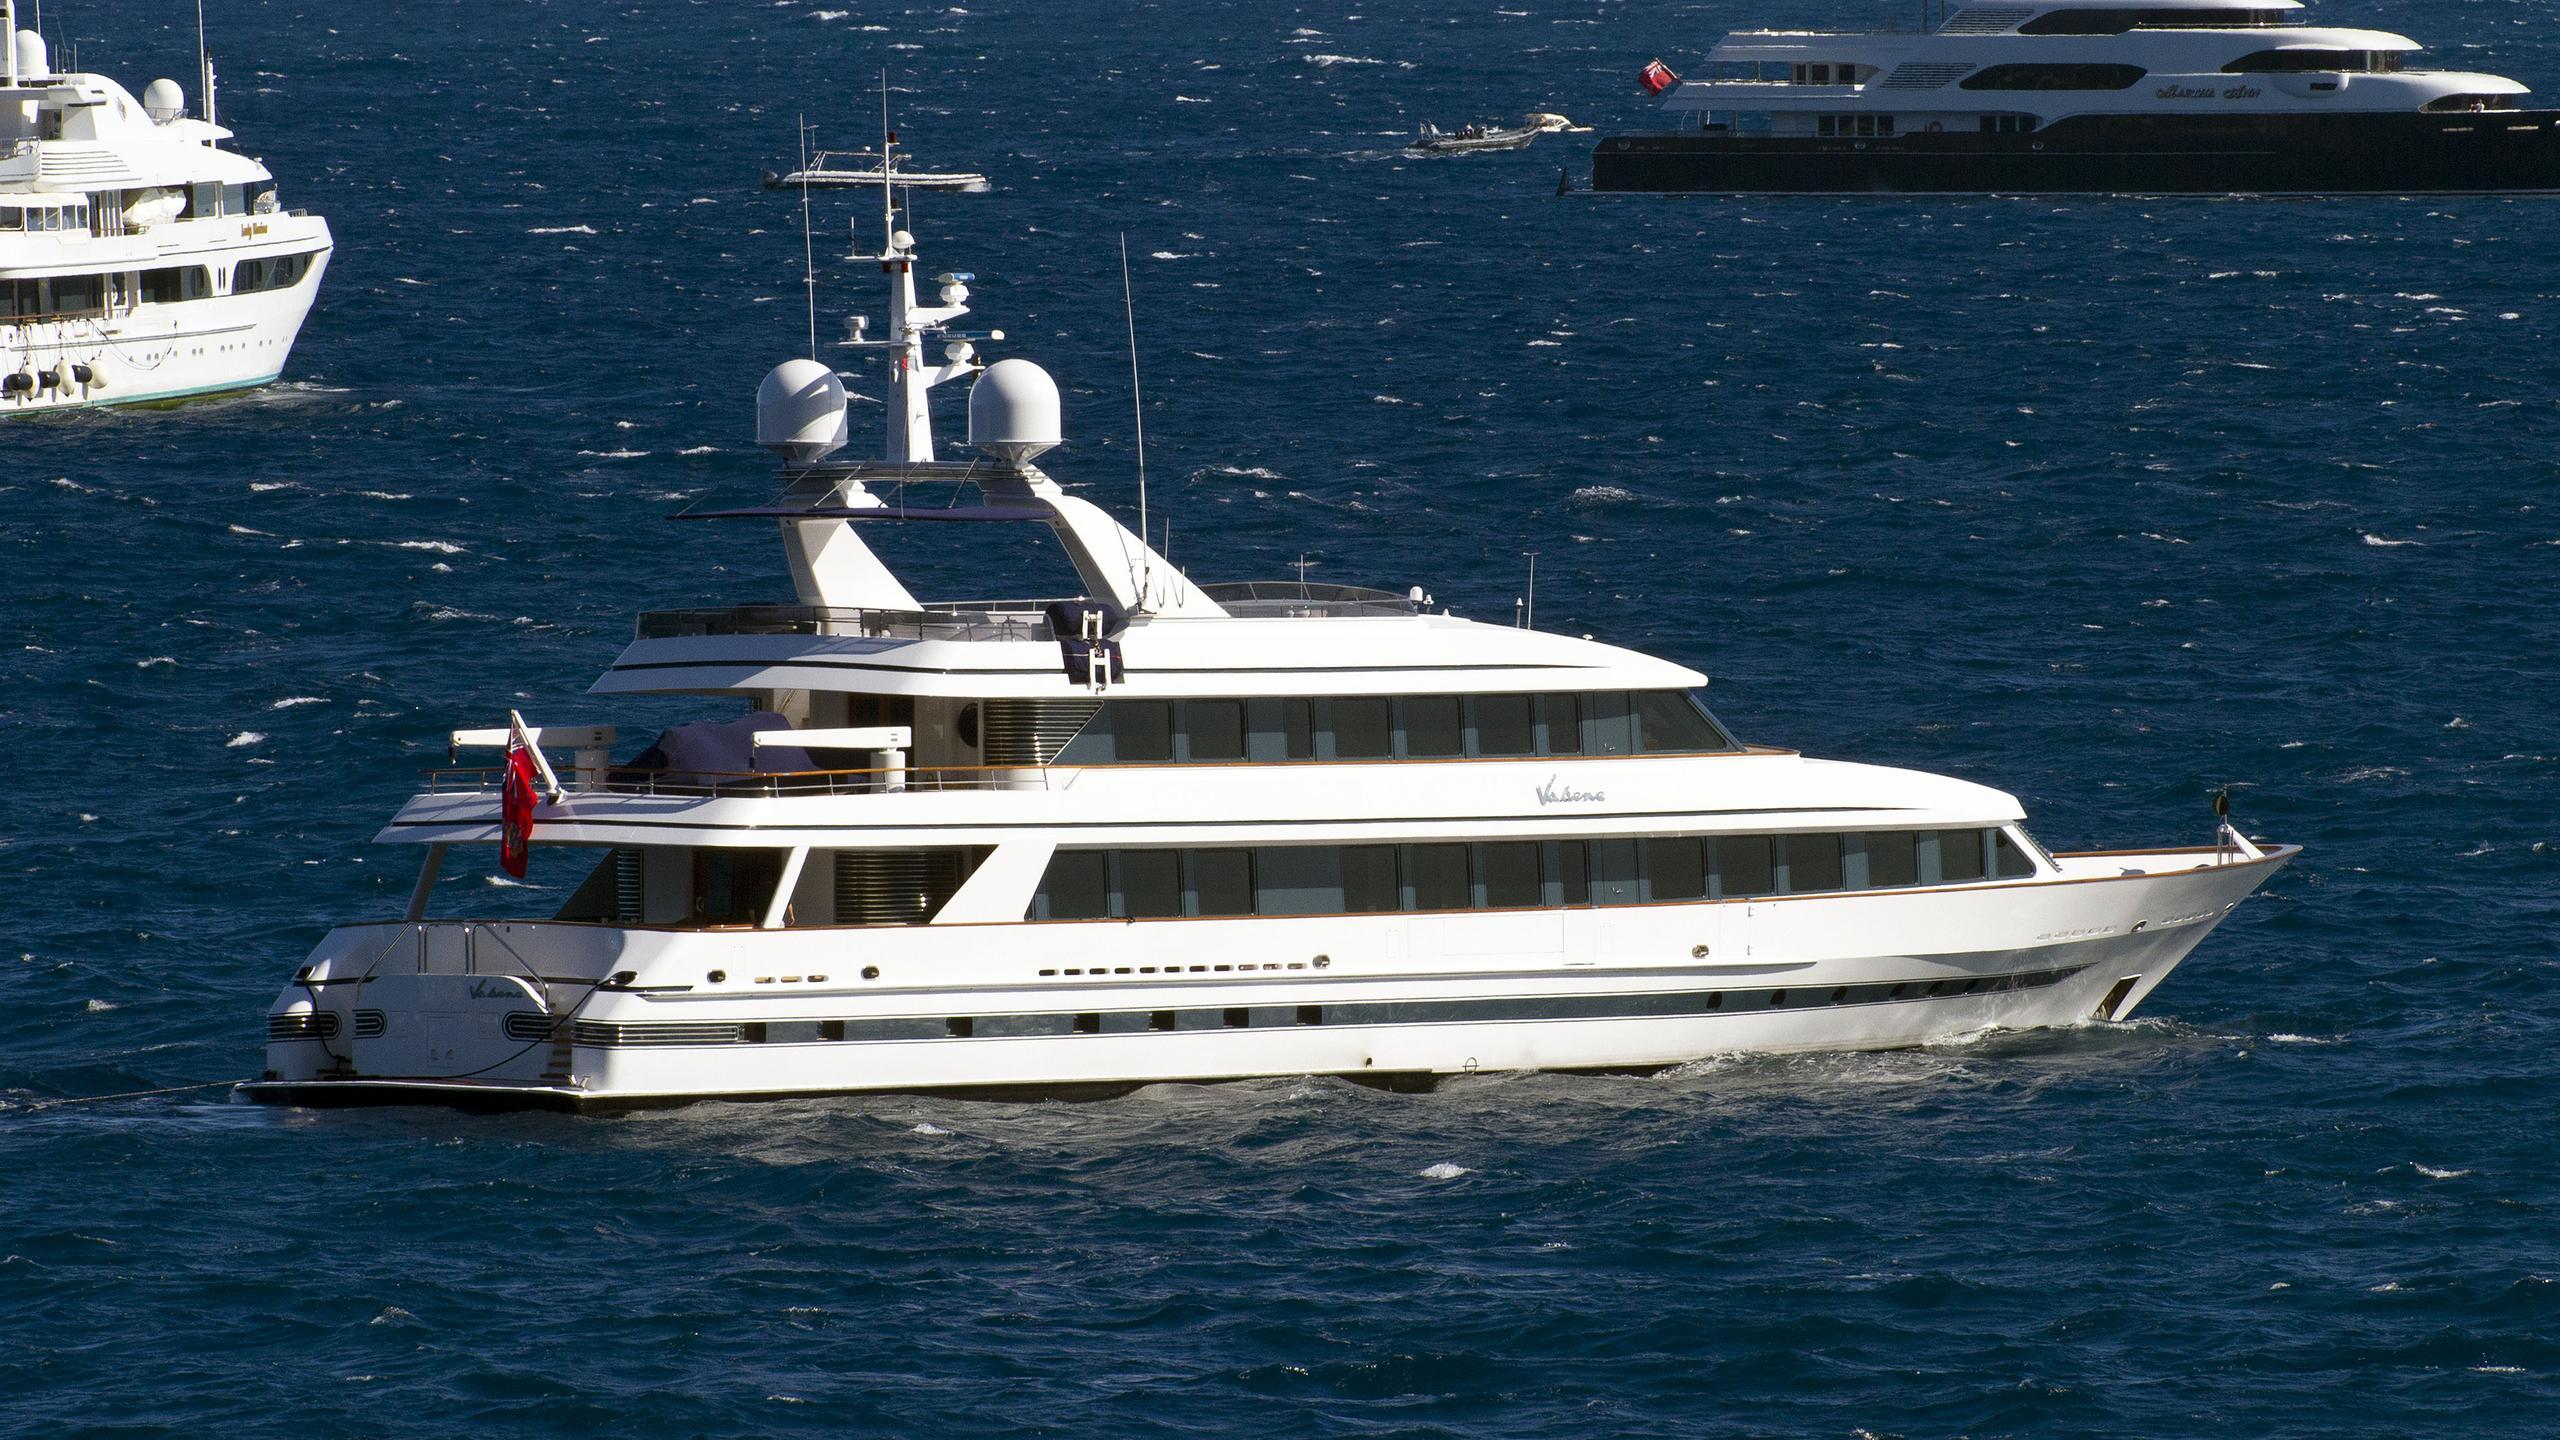 va-bene-motor-yacht-cornelissen-1992-46m-half-stern